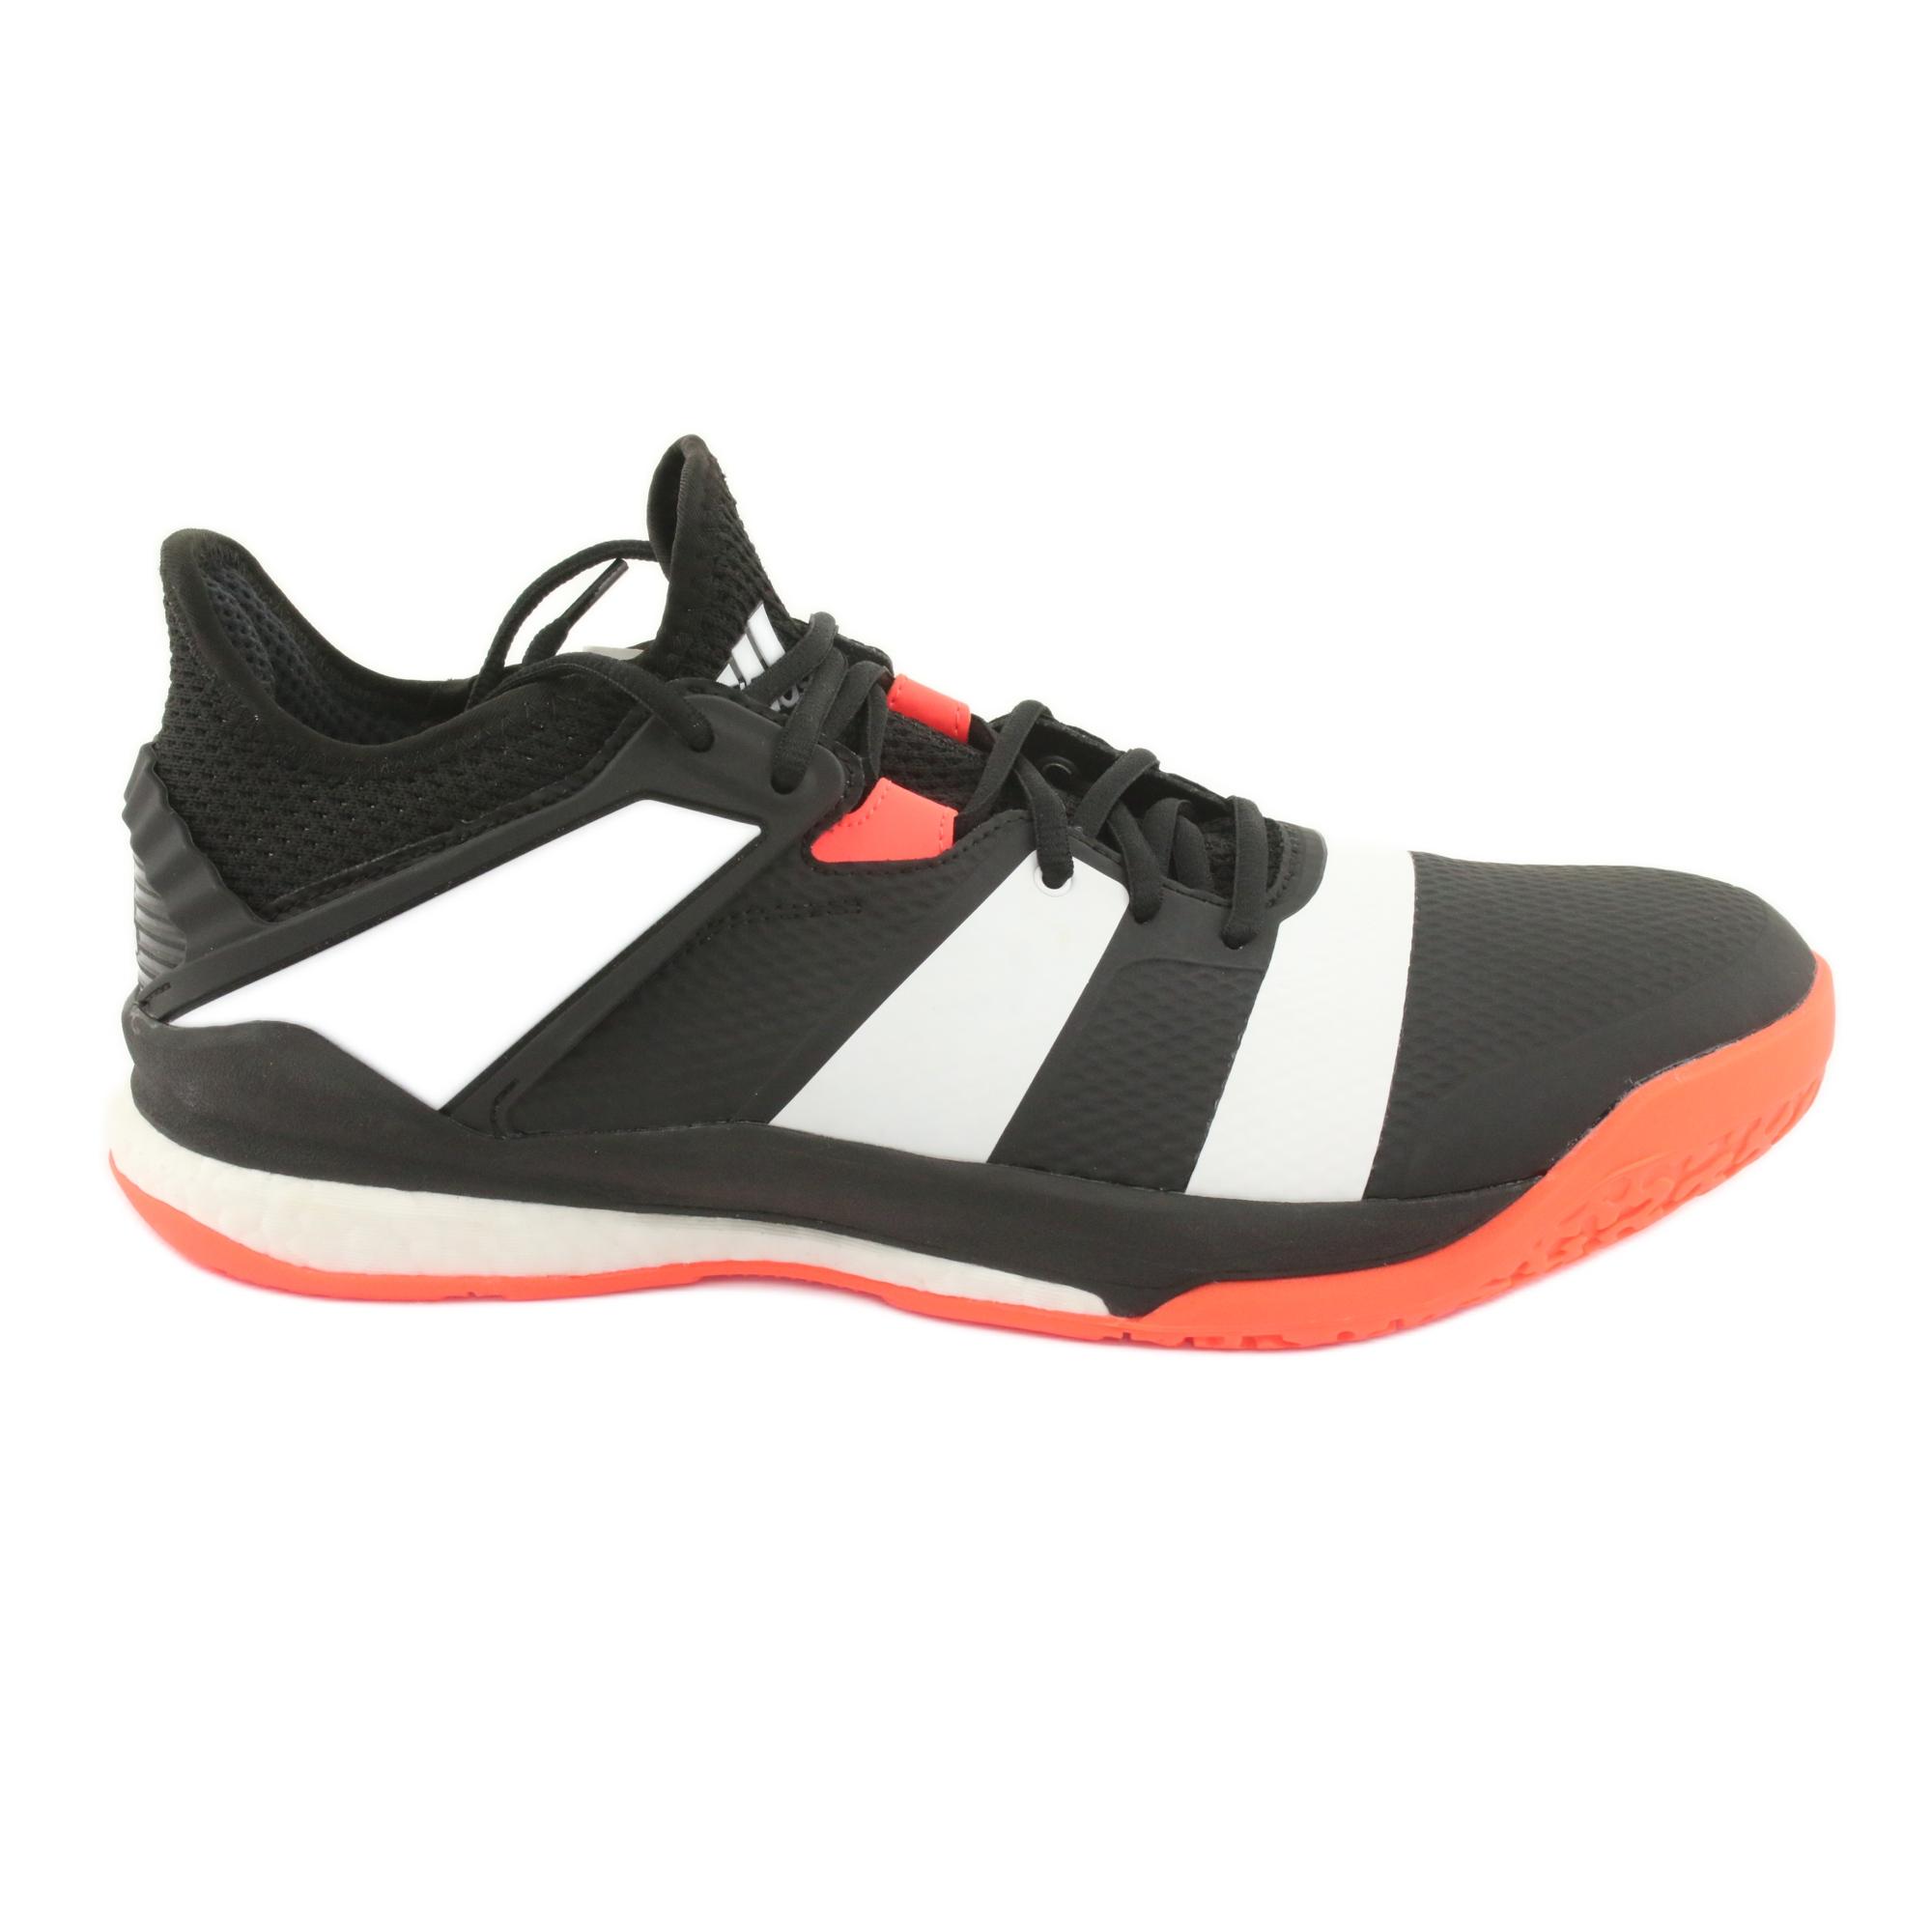 Details zu Adidas Stabil XM G26421 shoes